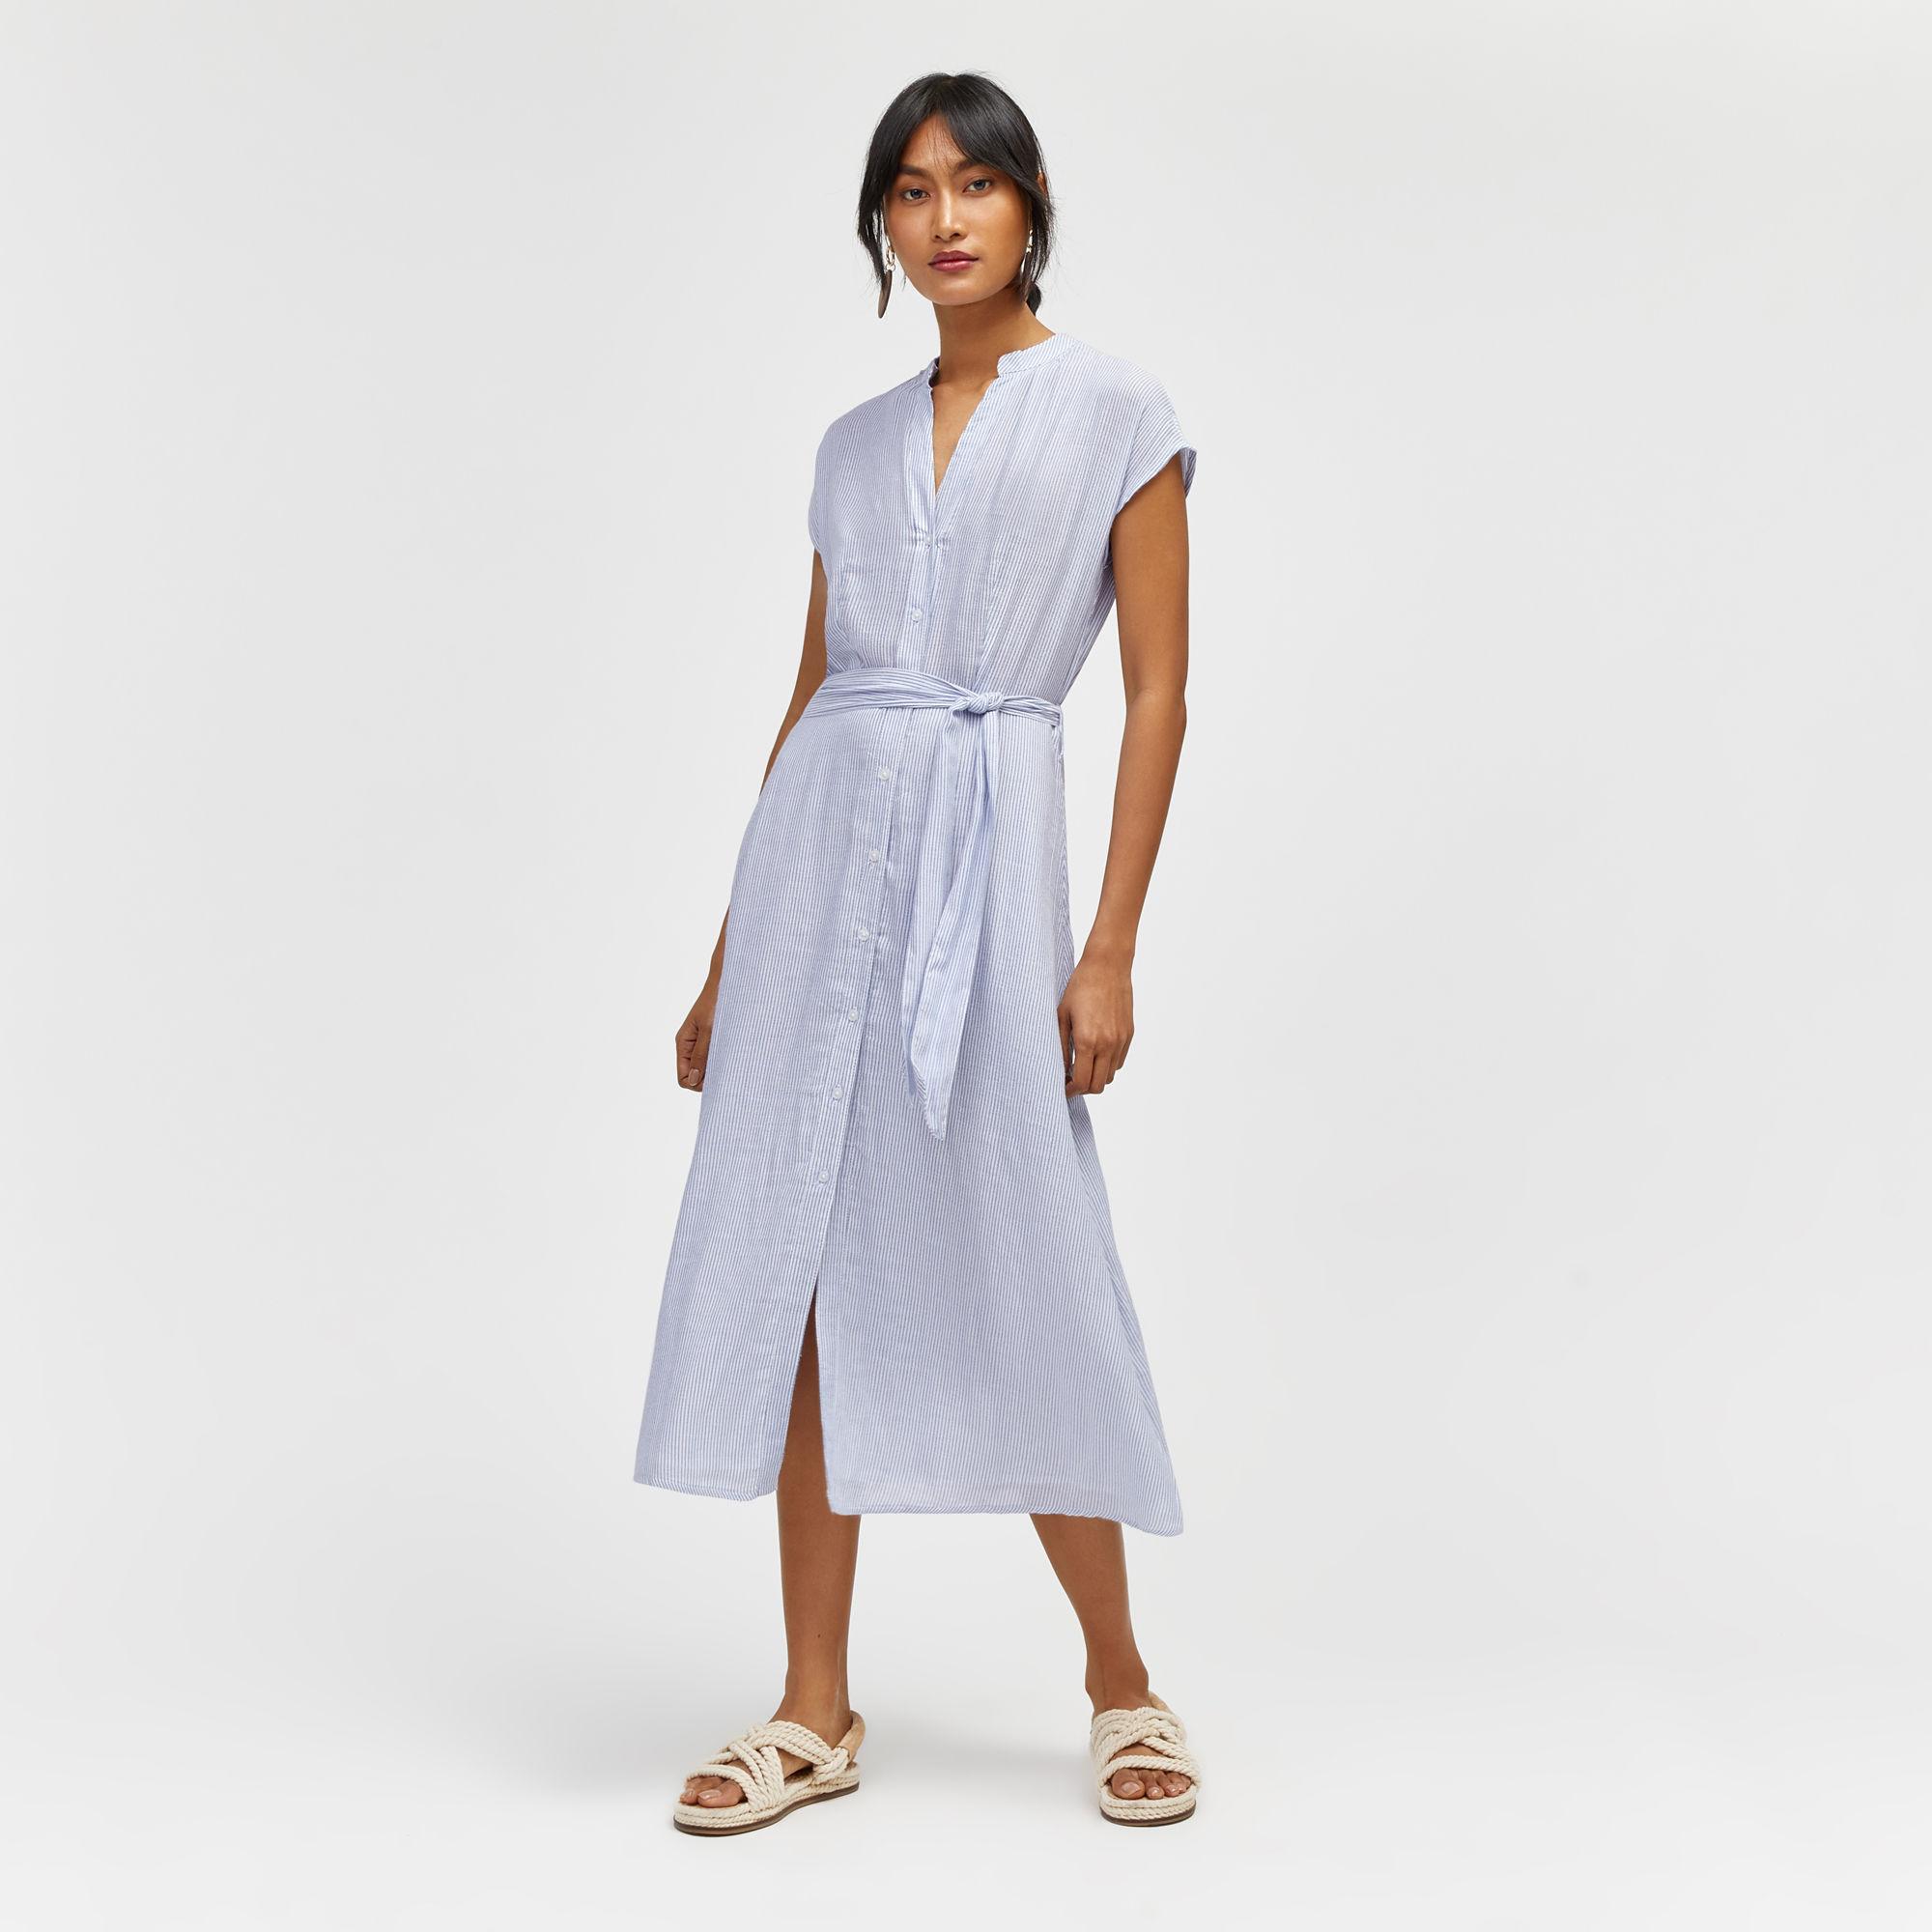 blue and white striped shirt dress warehouse